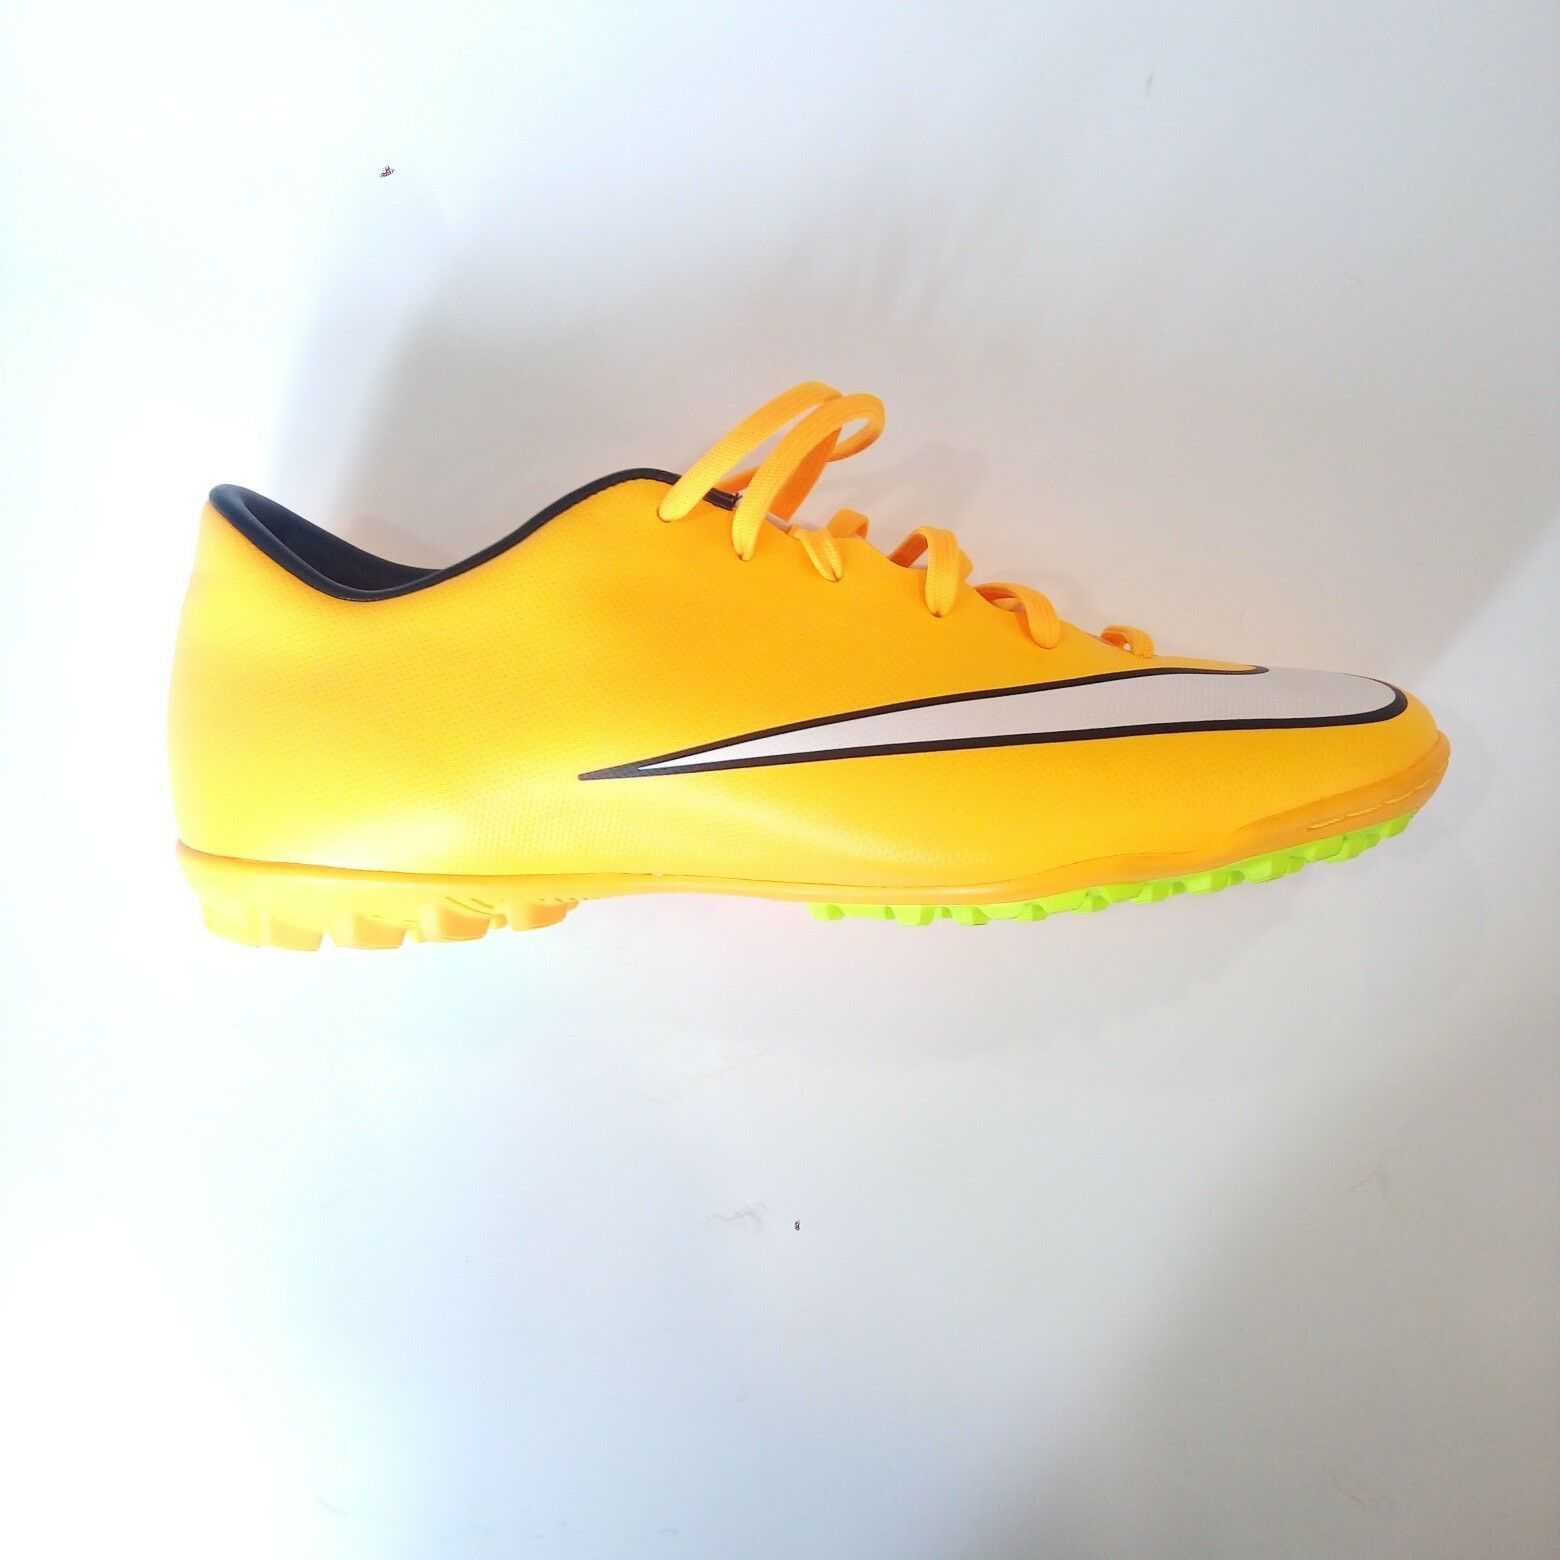 on sale 4314c 24c01 Scarpe Calcetto Nike Nike Nike Mercurial V TF - Arancio Fluo SCONTATE     651646 b7a802